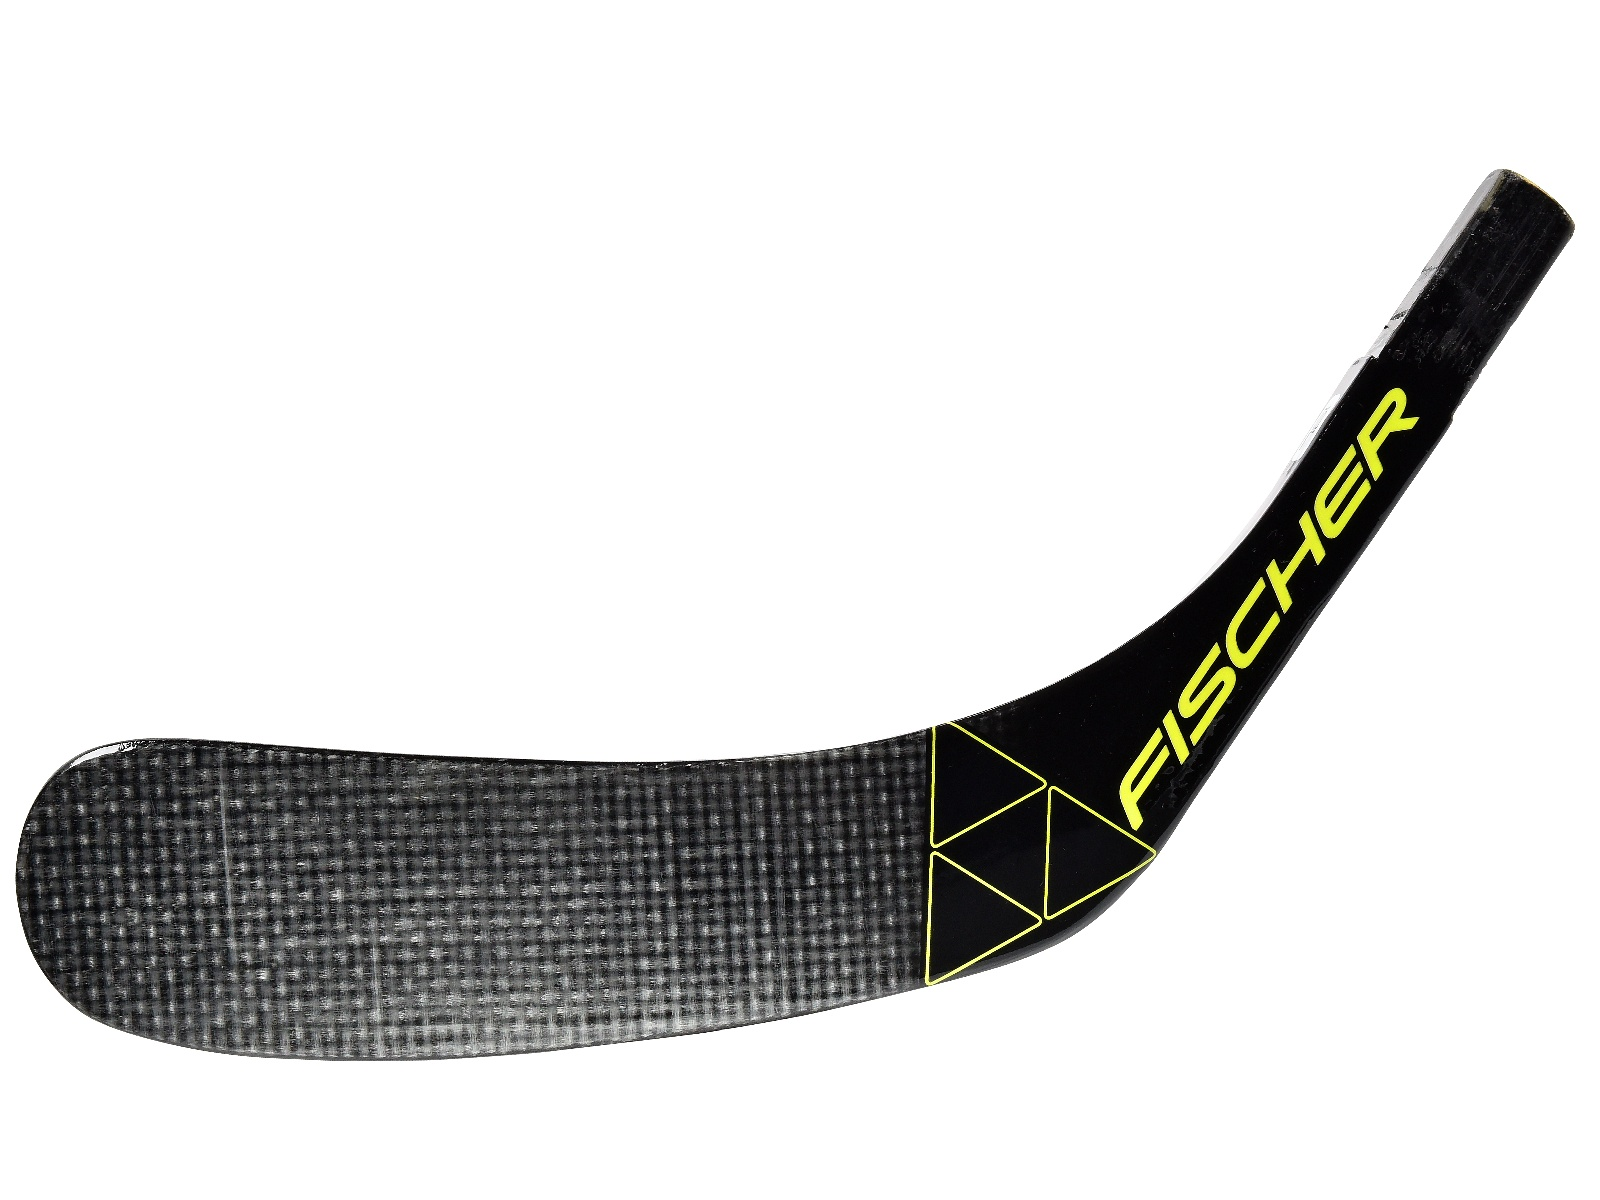 Hokejová čepel FISCHER W300 Senior - LH 92